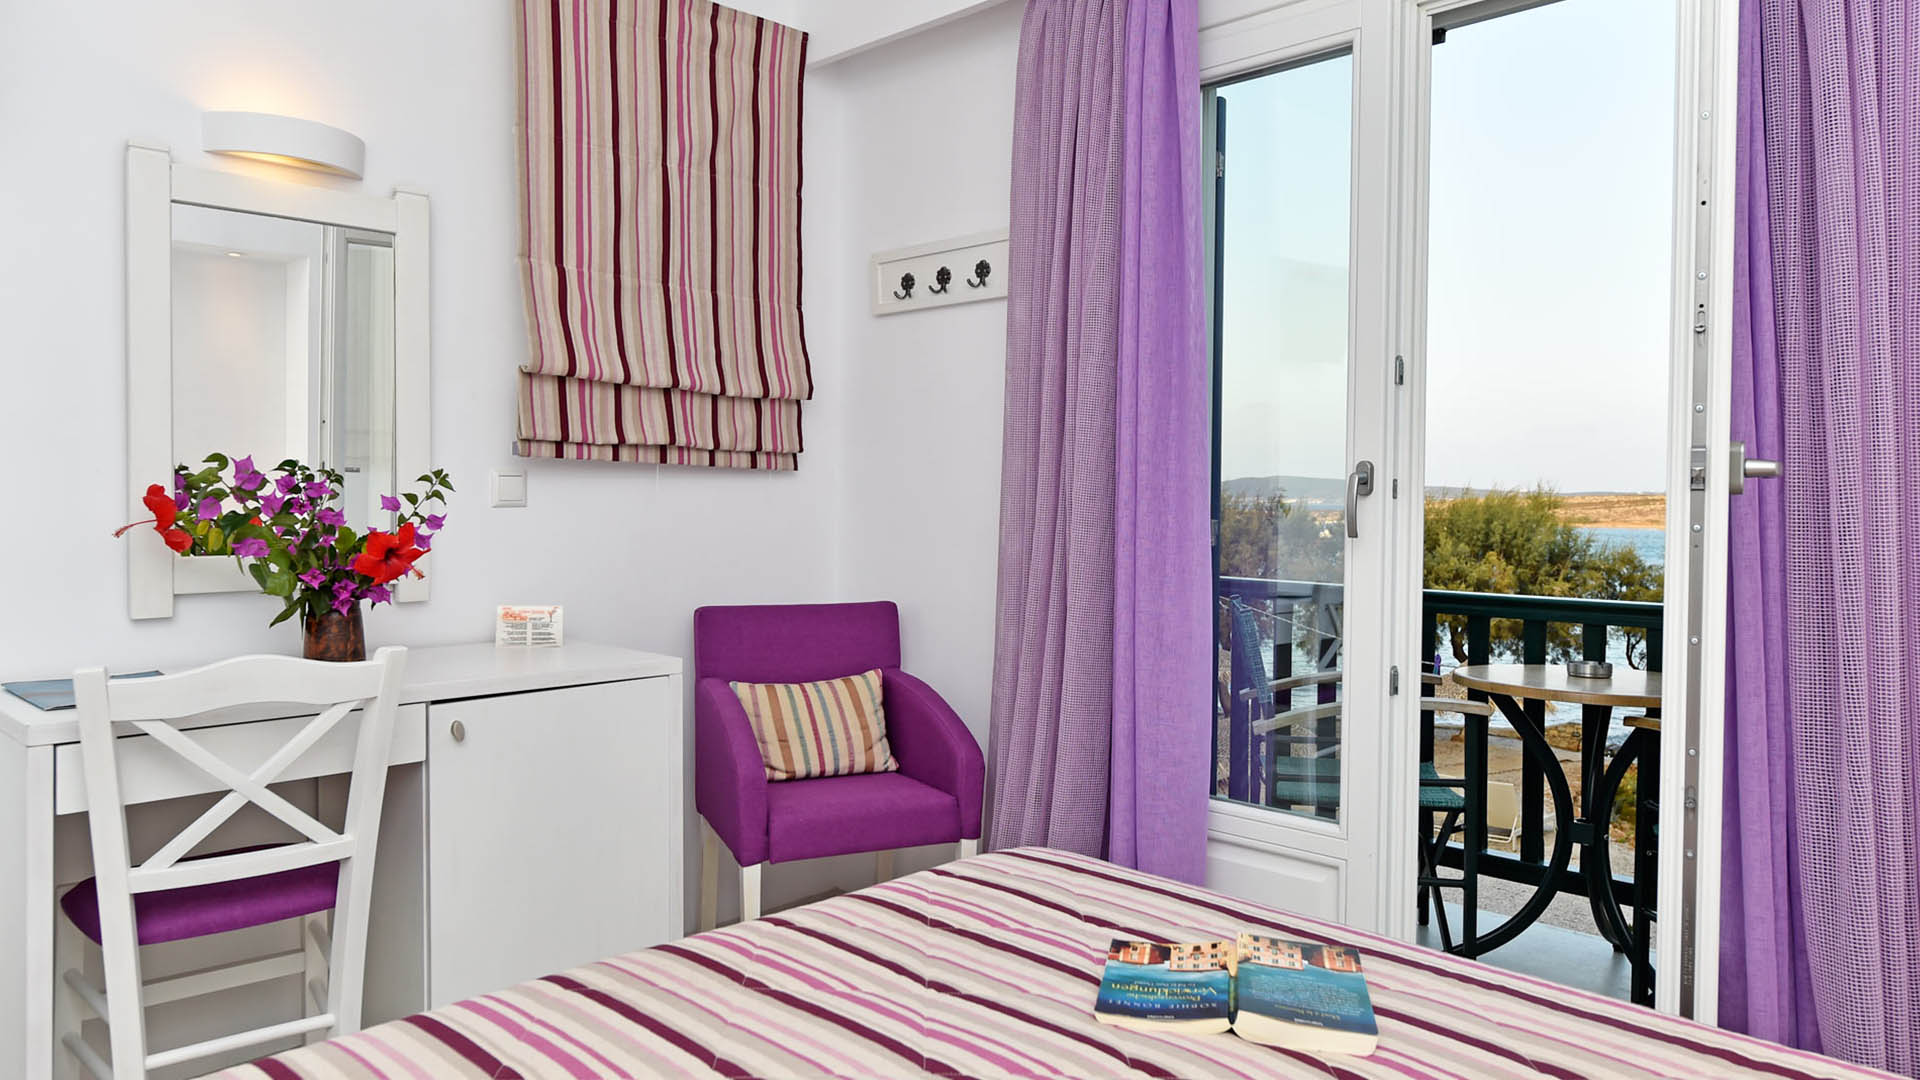 Kalypso Hotel – Suites 2 4 (1)